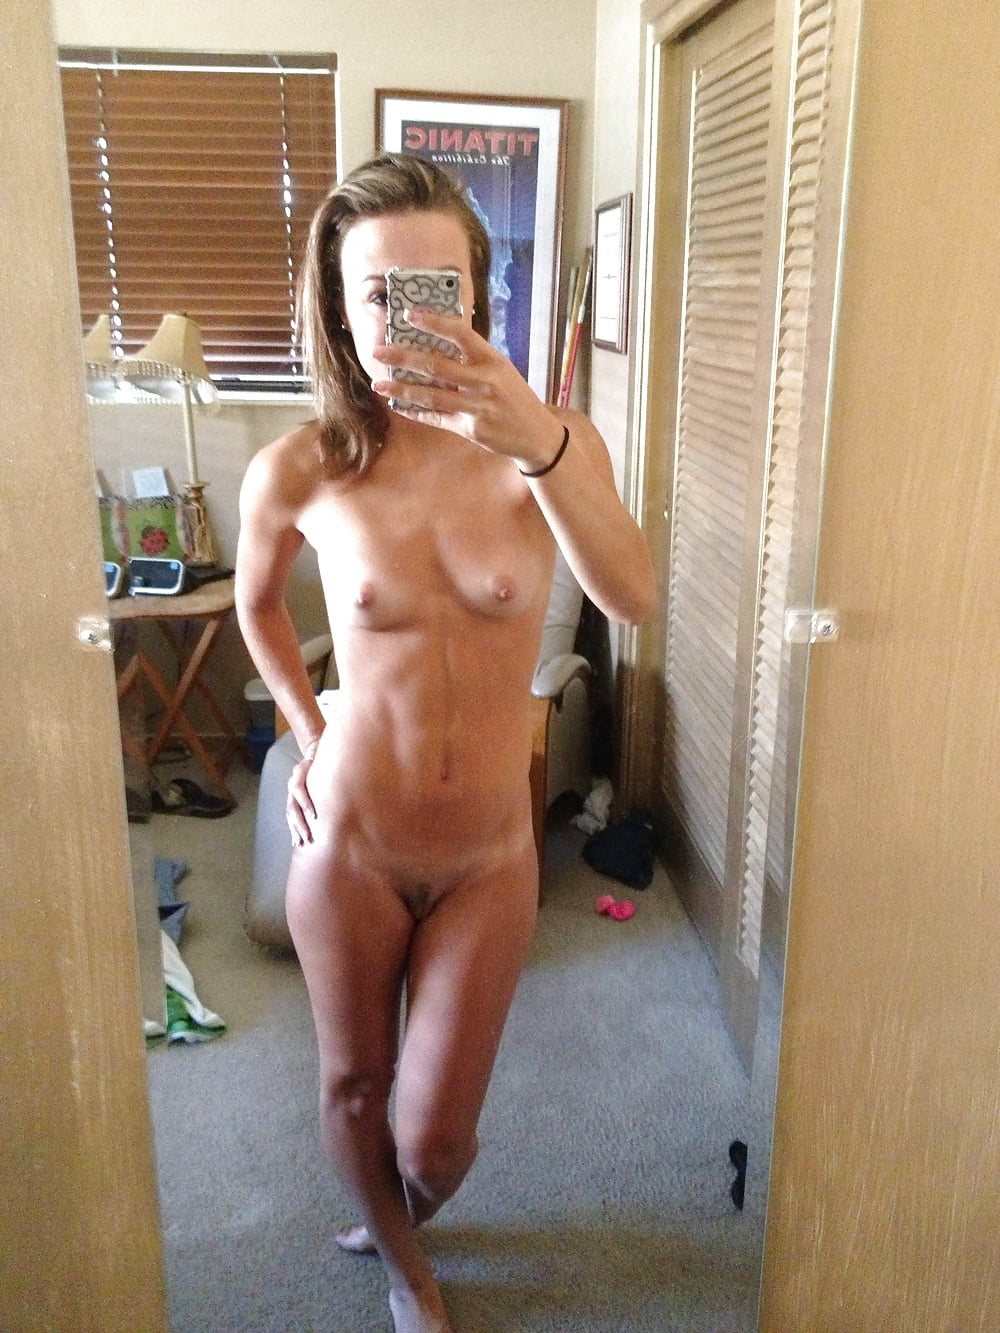 Boy Girl Porn Selfie